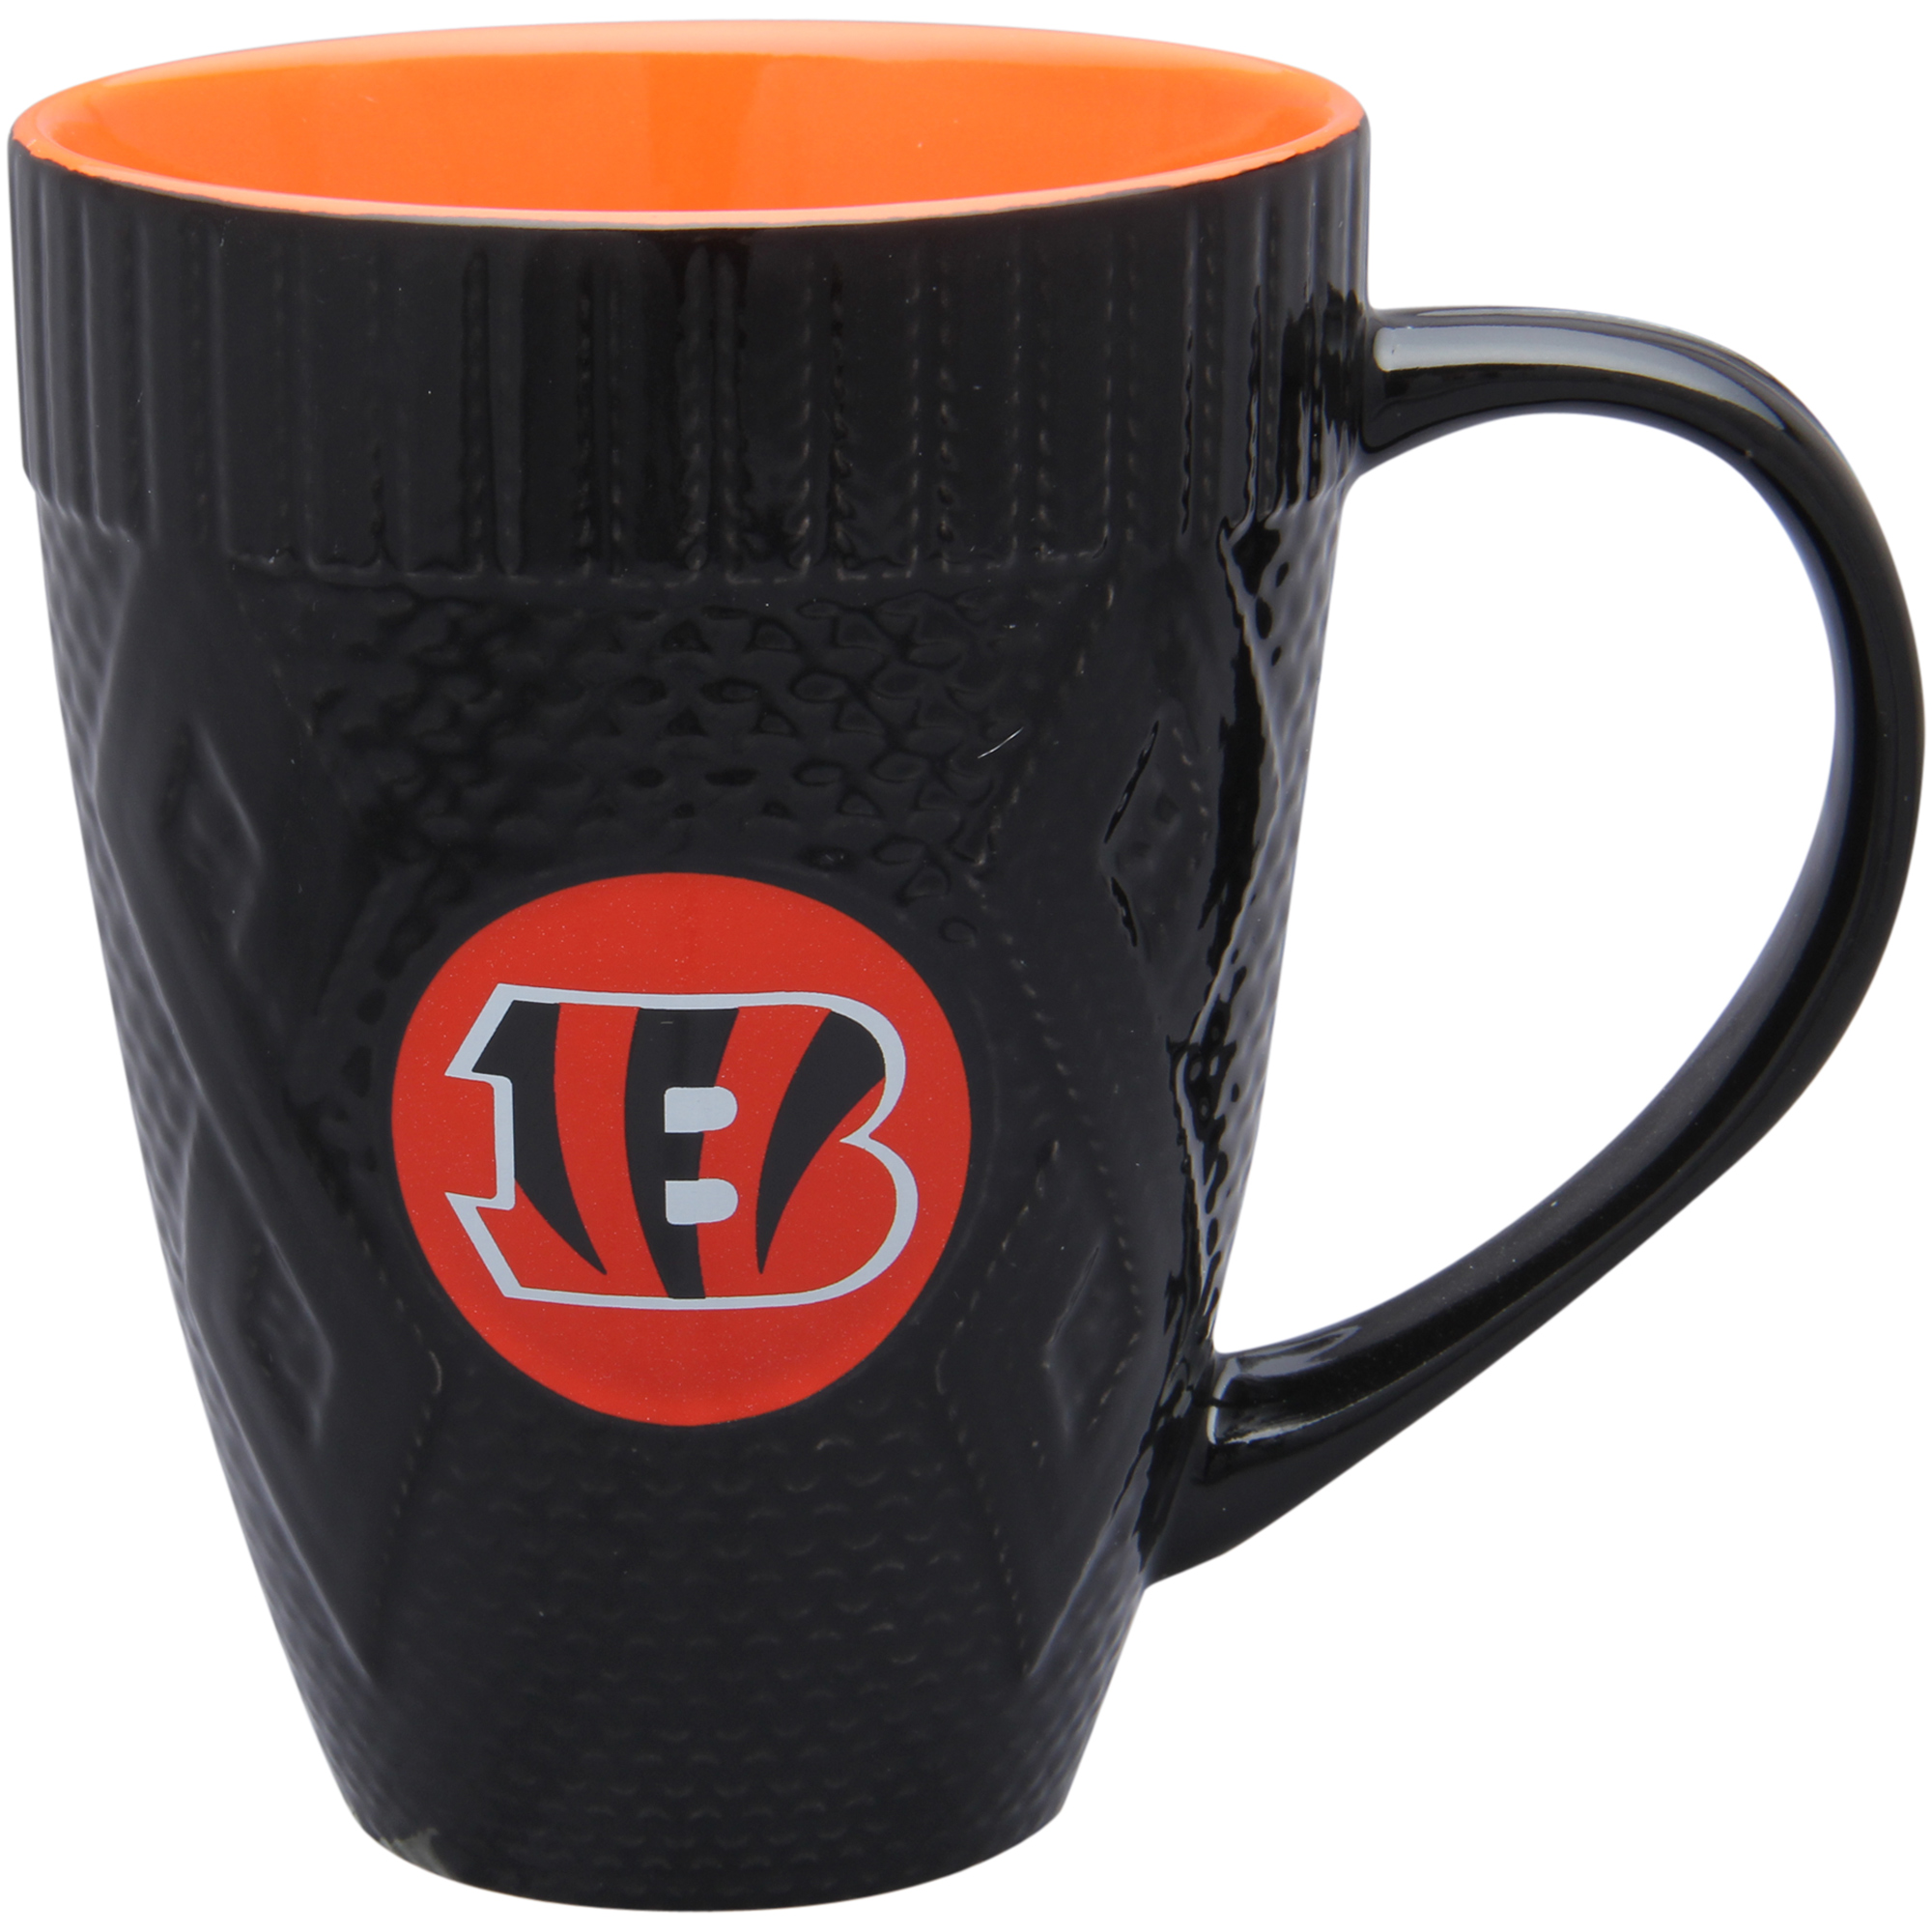 Cincinnati Bengals 16oz. Sweater Mug - No Size